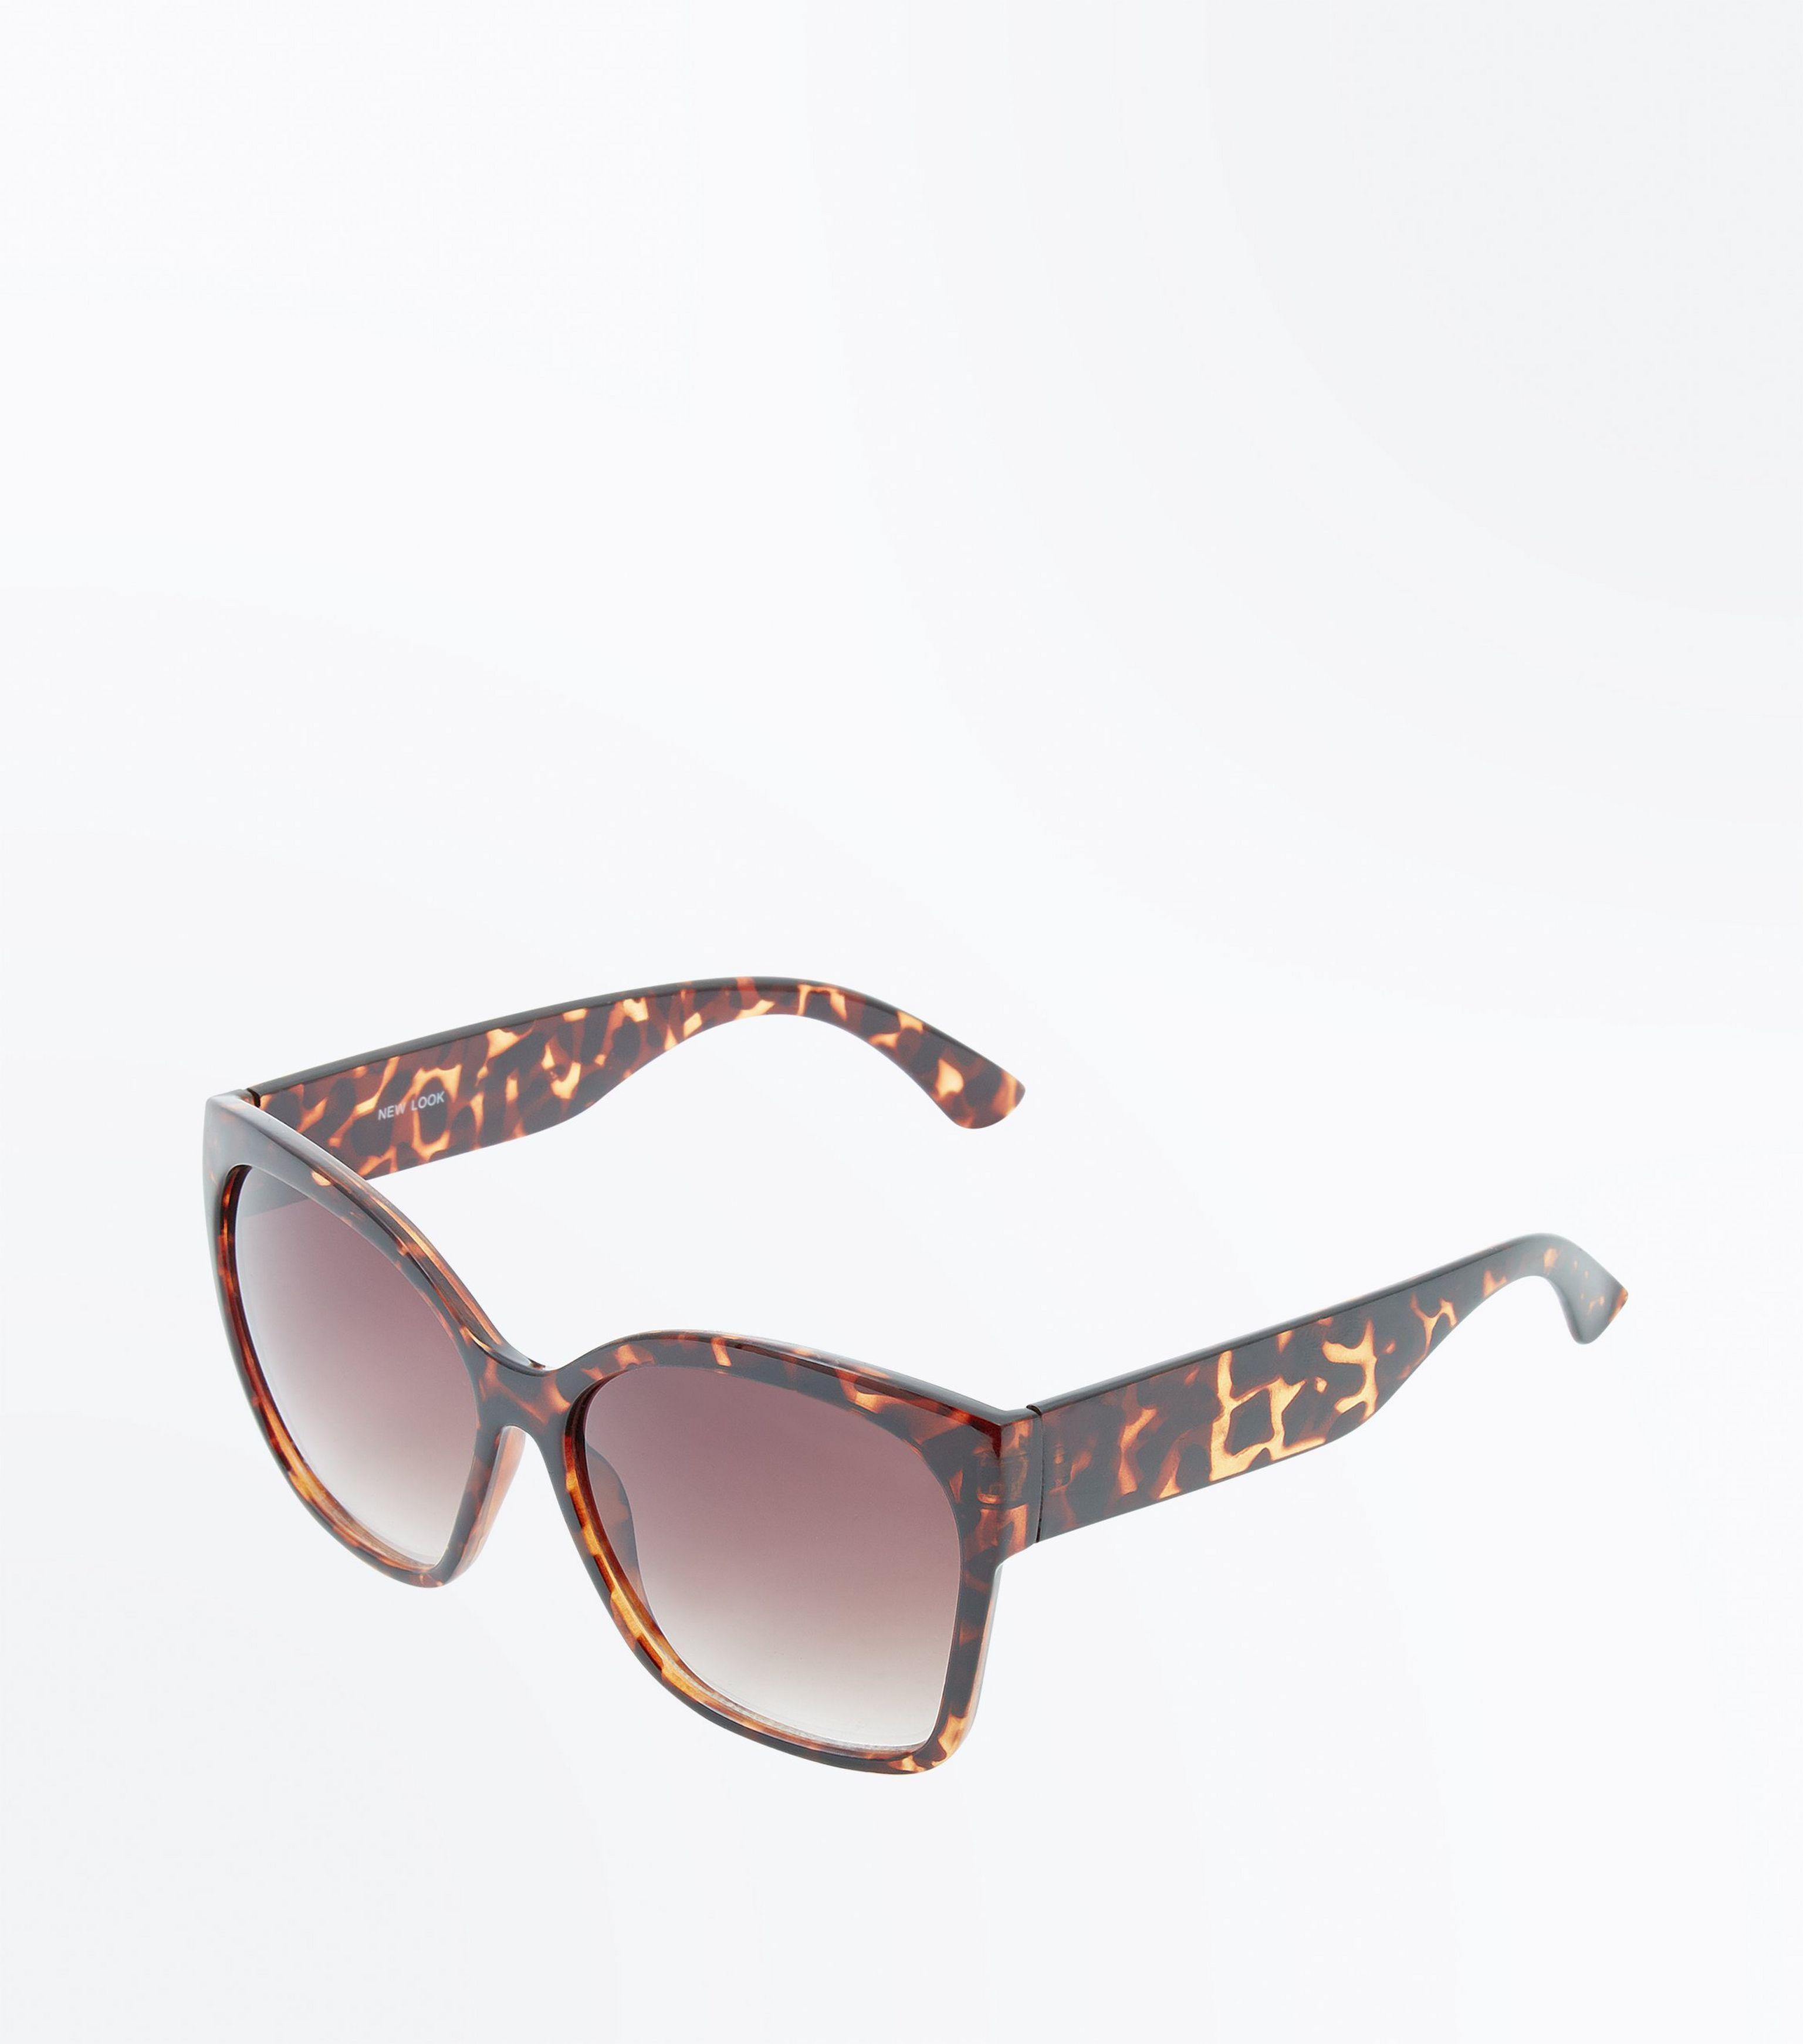 c7d942484b6 New Look Dark Brown Tortoiseshell Oversized Sunglasses in Brown - Lyst